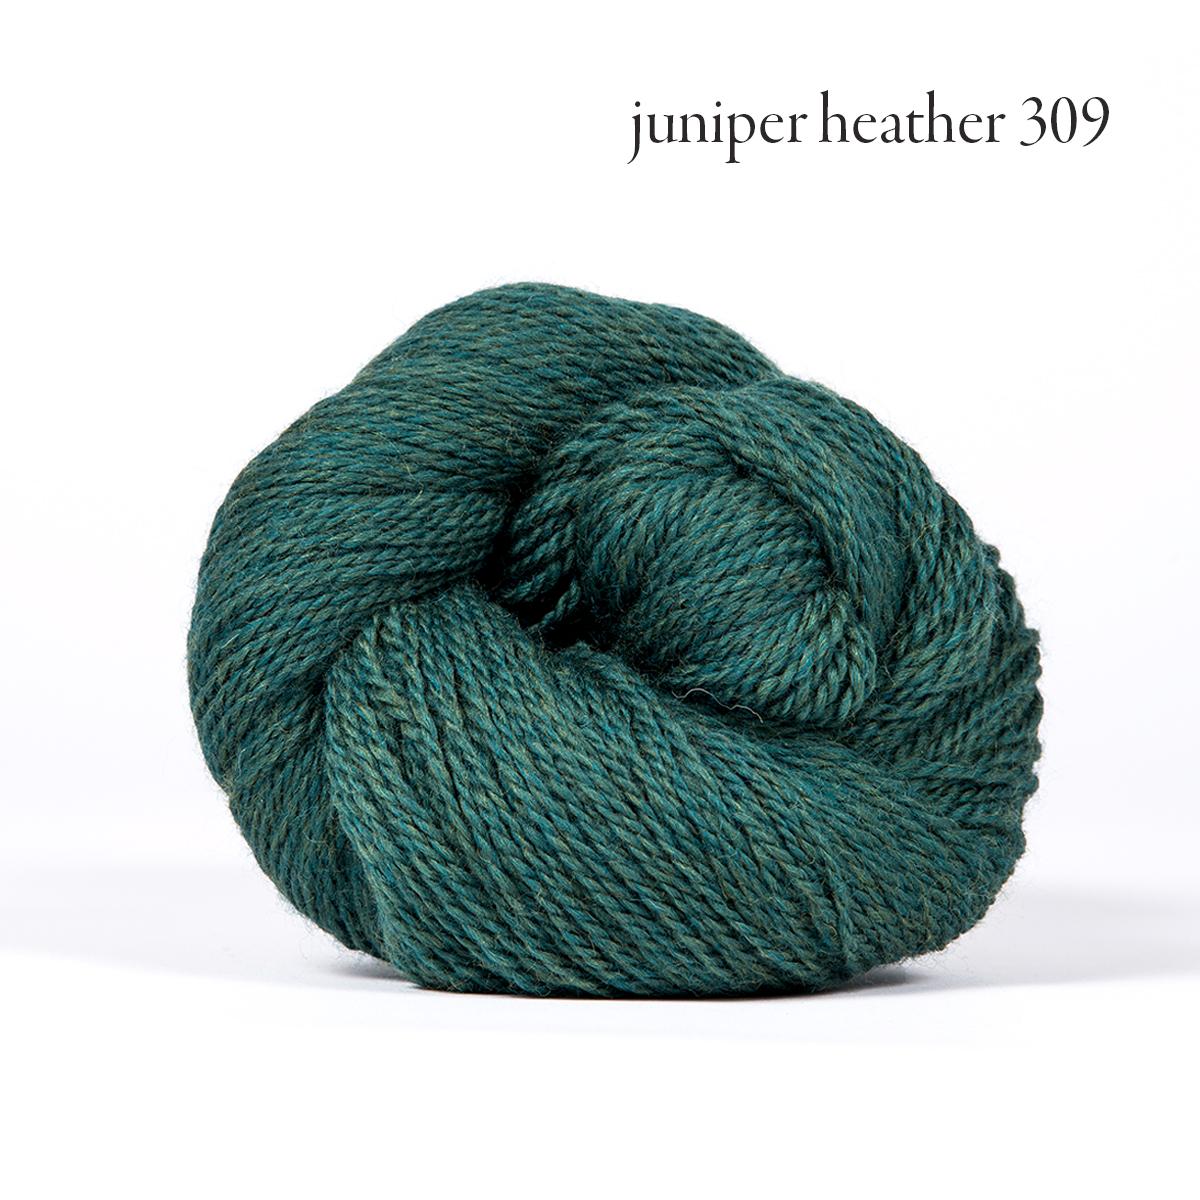 juniper heather 309.jpg